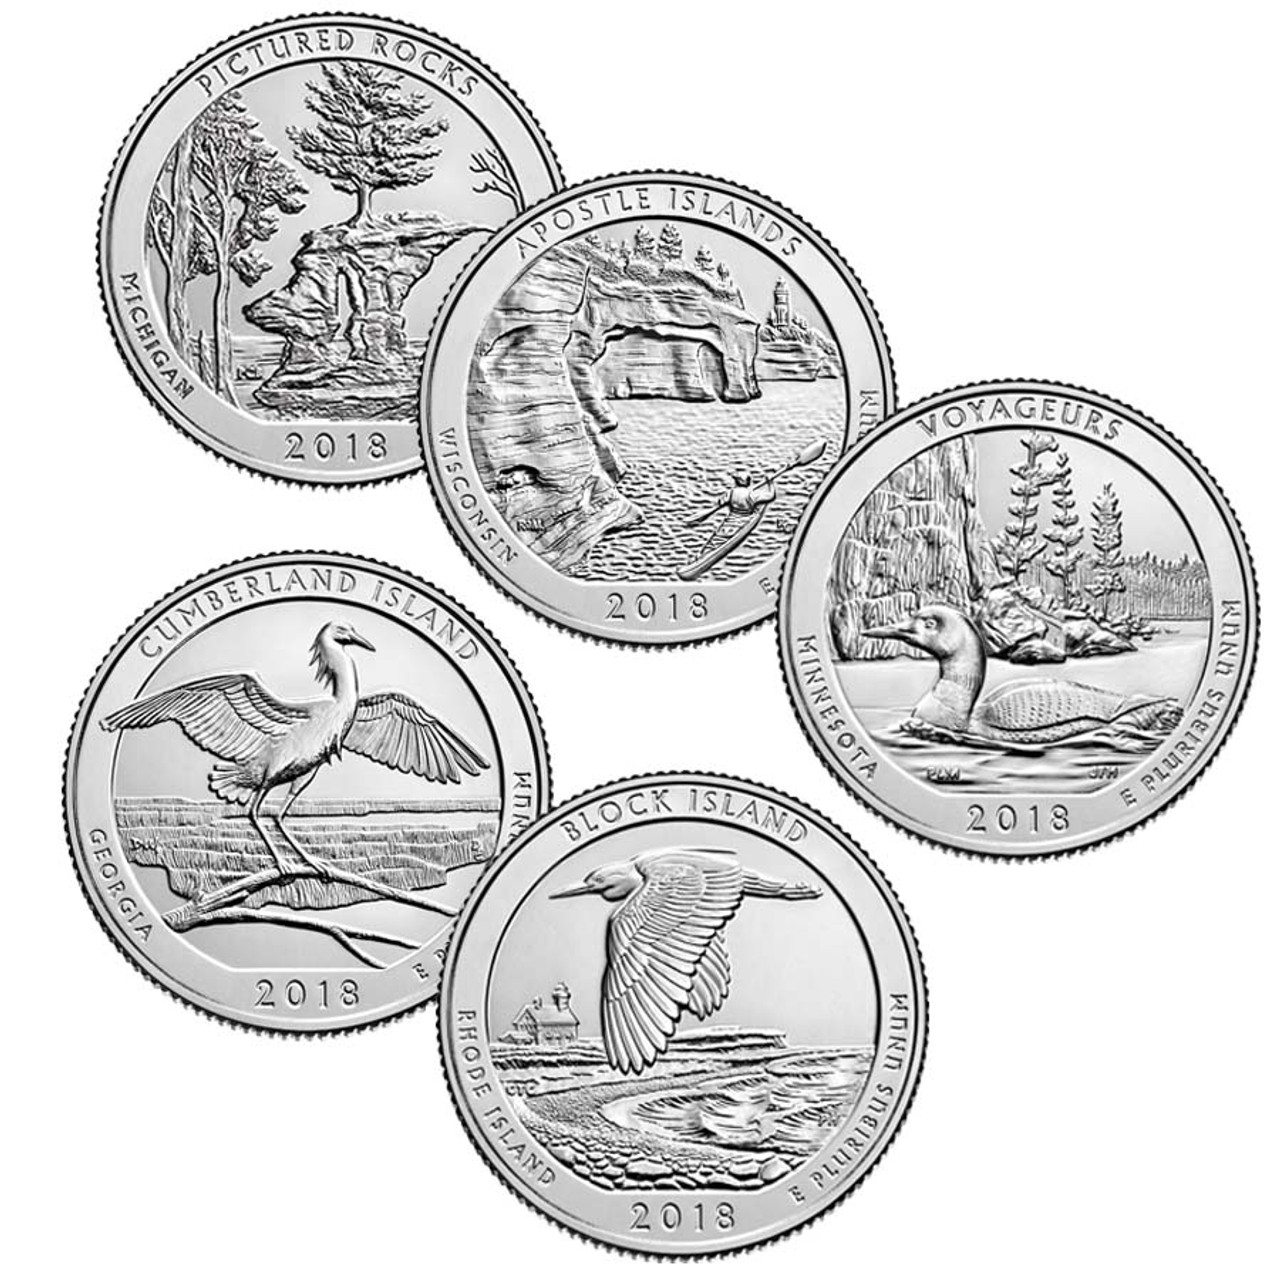 2018 National Park Quarters 5 Coins Brilliant Uncirculated Image 1